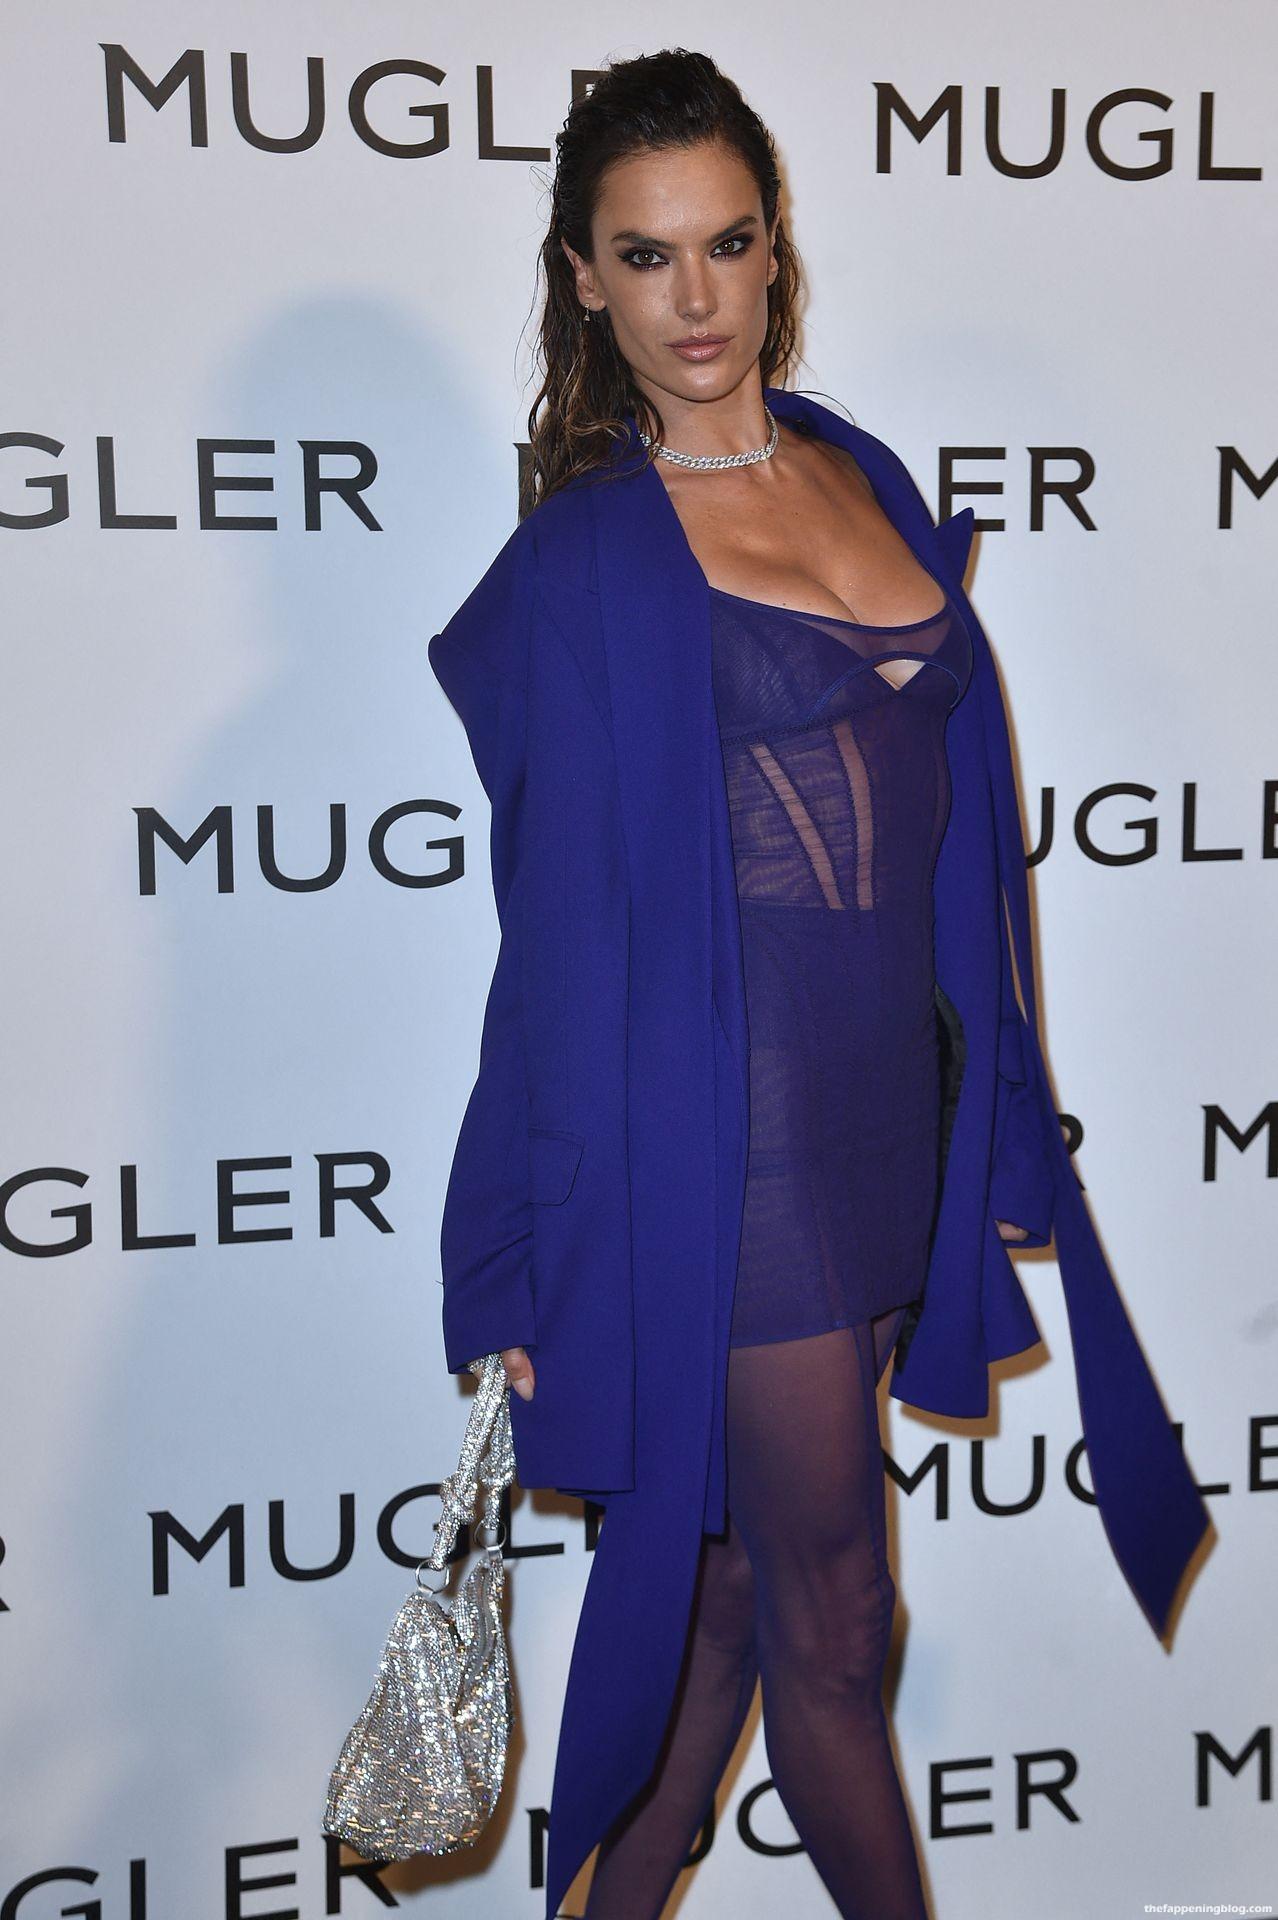 Alessandra-Ambrosio-Sexy-The-Fappening-Blog-6-4.jpg